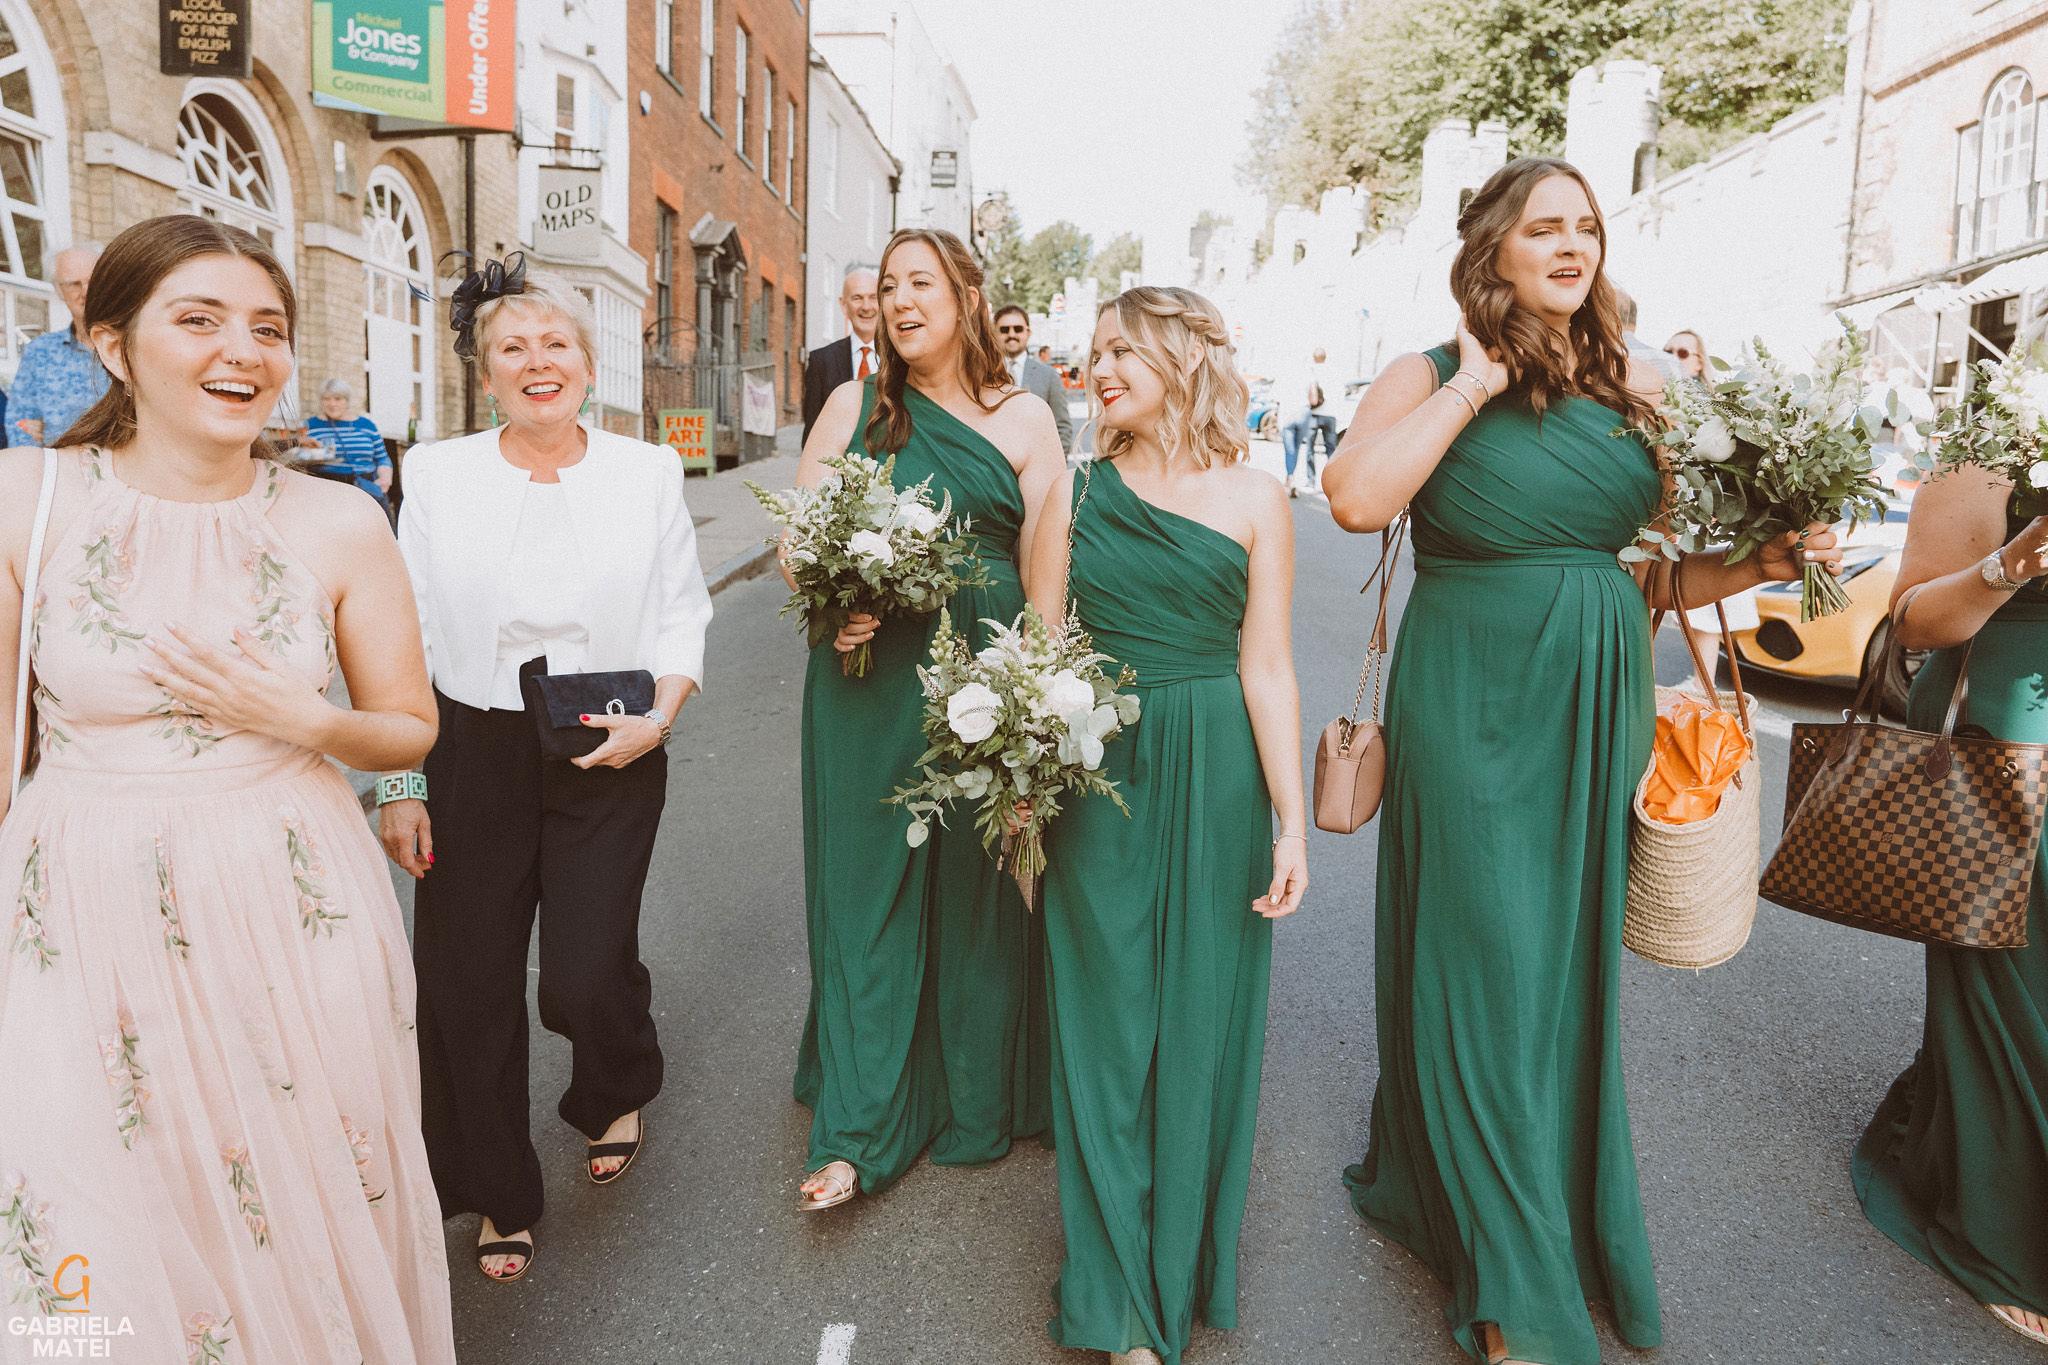 Bridesmaids walking down on High Street in Arundel during wedding at South Stoke Barn wedding venue in Arundel